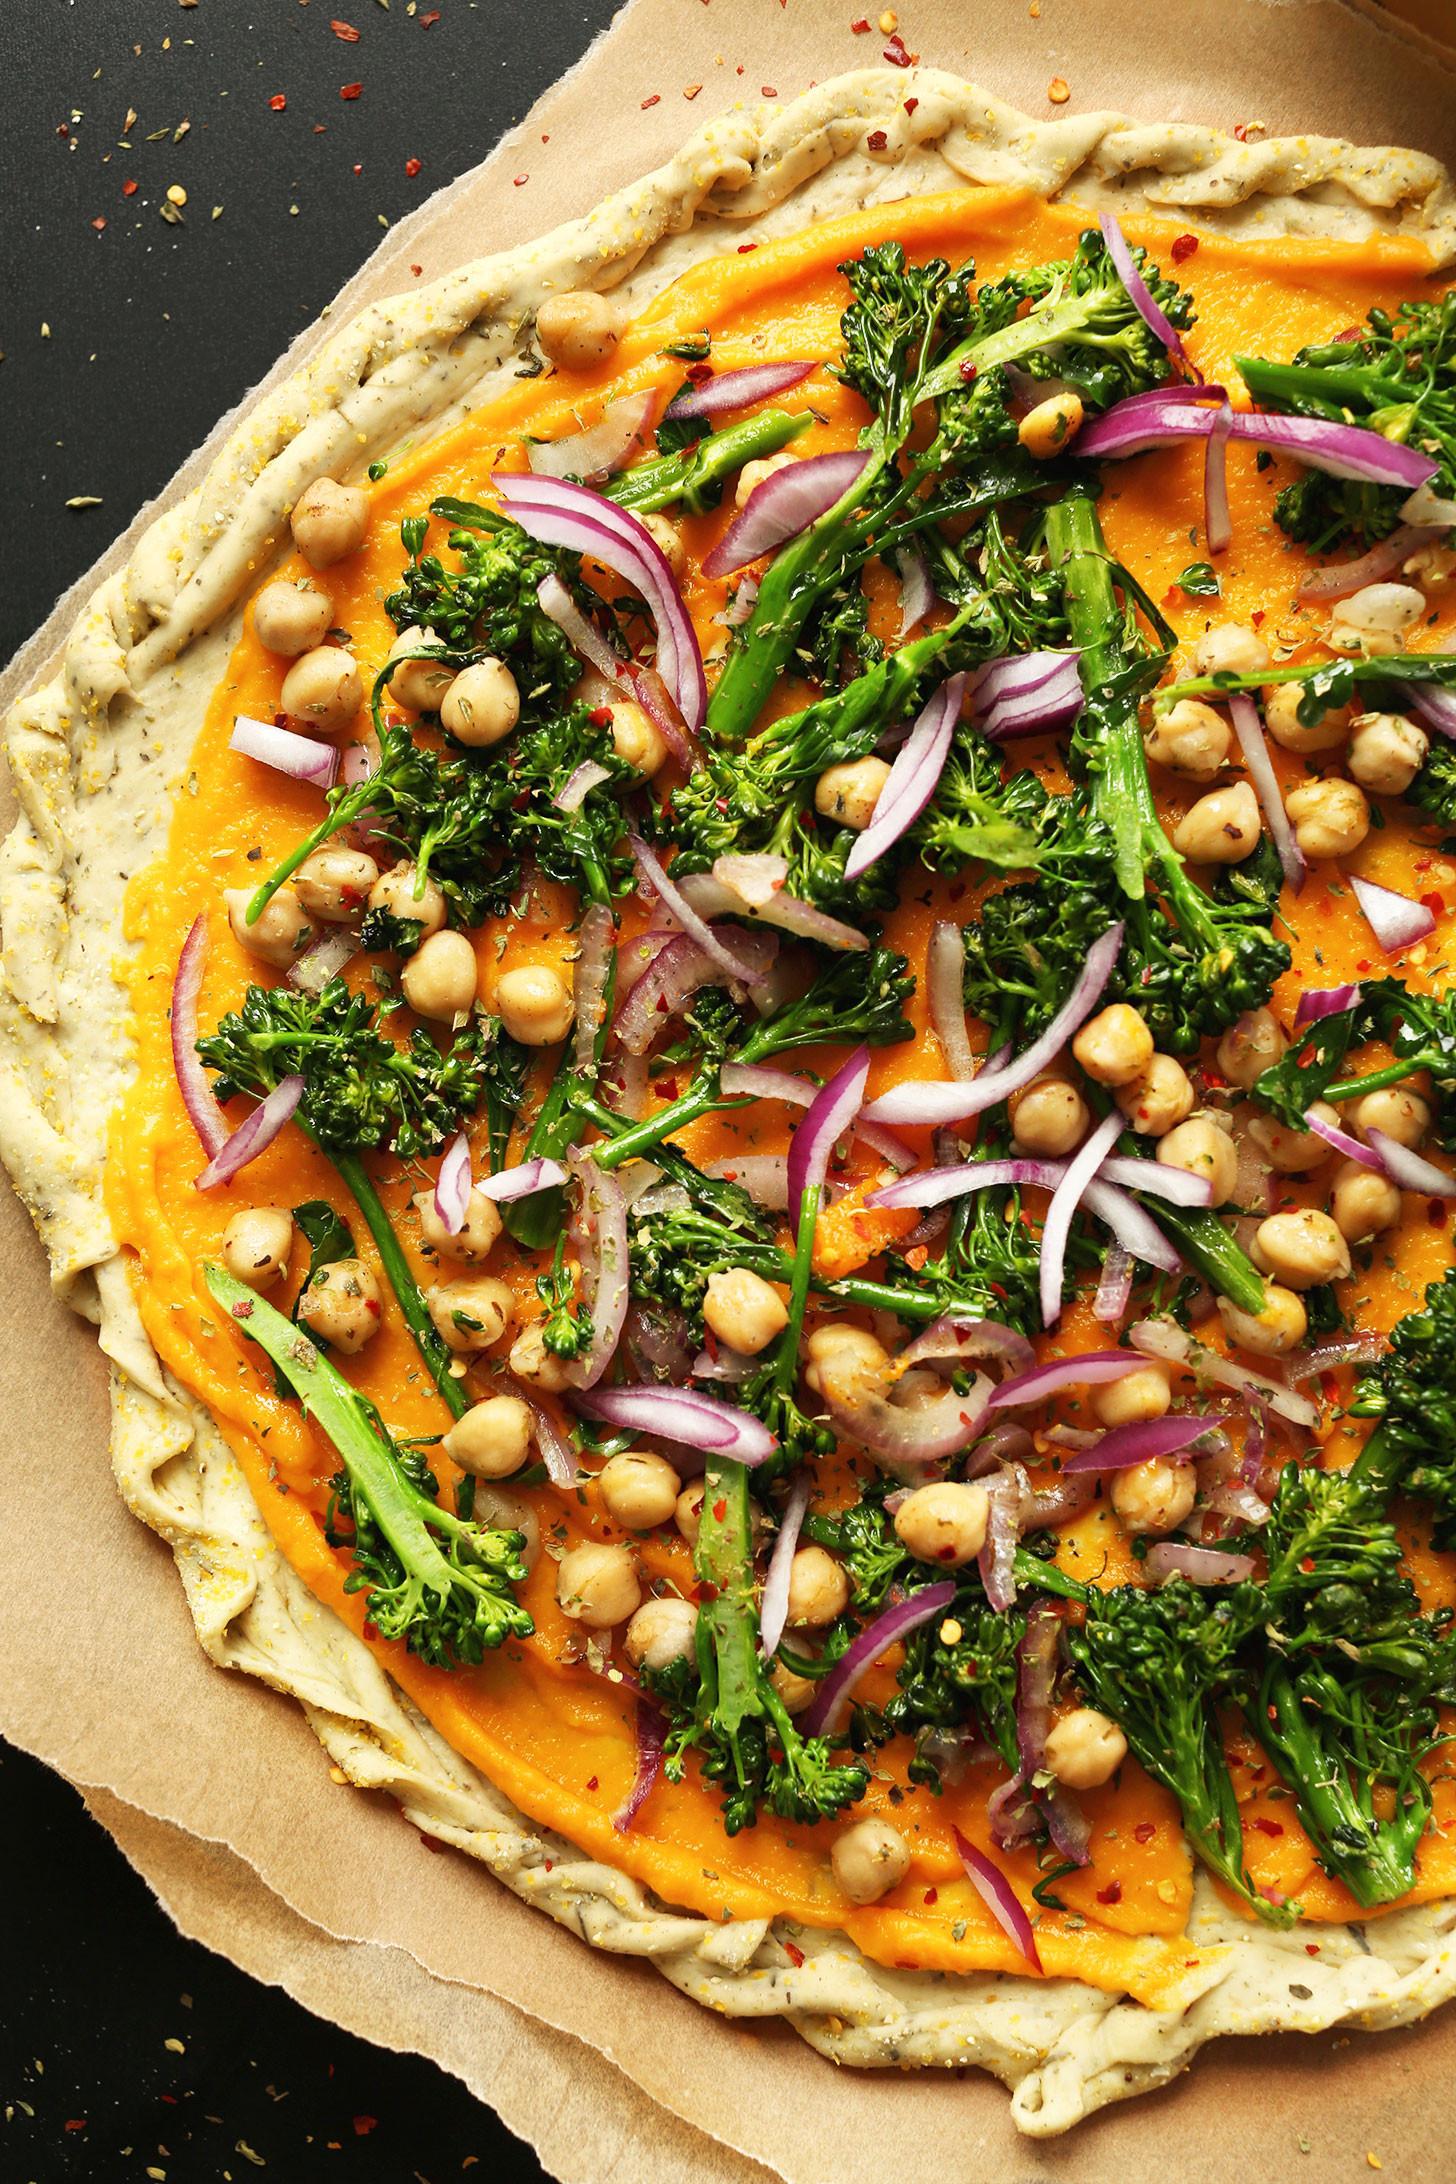 Vegan Dinner Recipes  30 delicious vegan dinner recipes for happy tummies